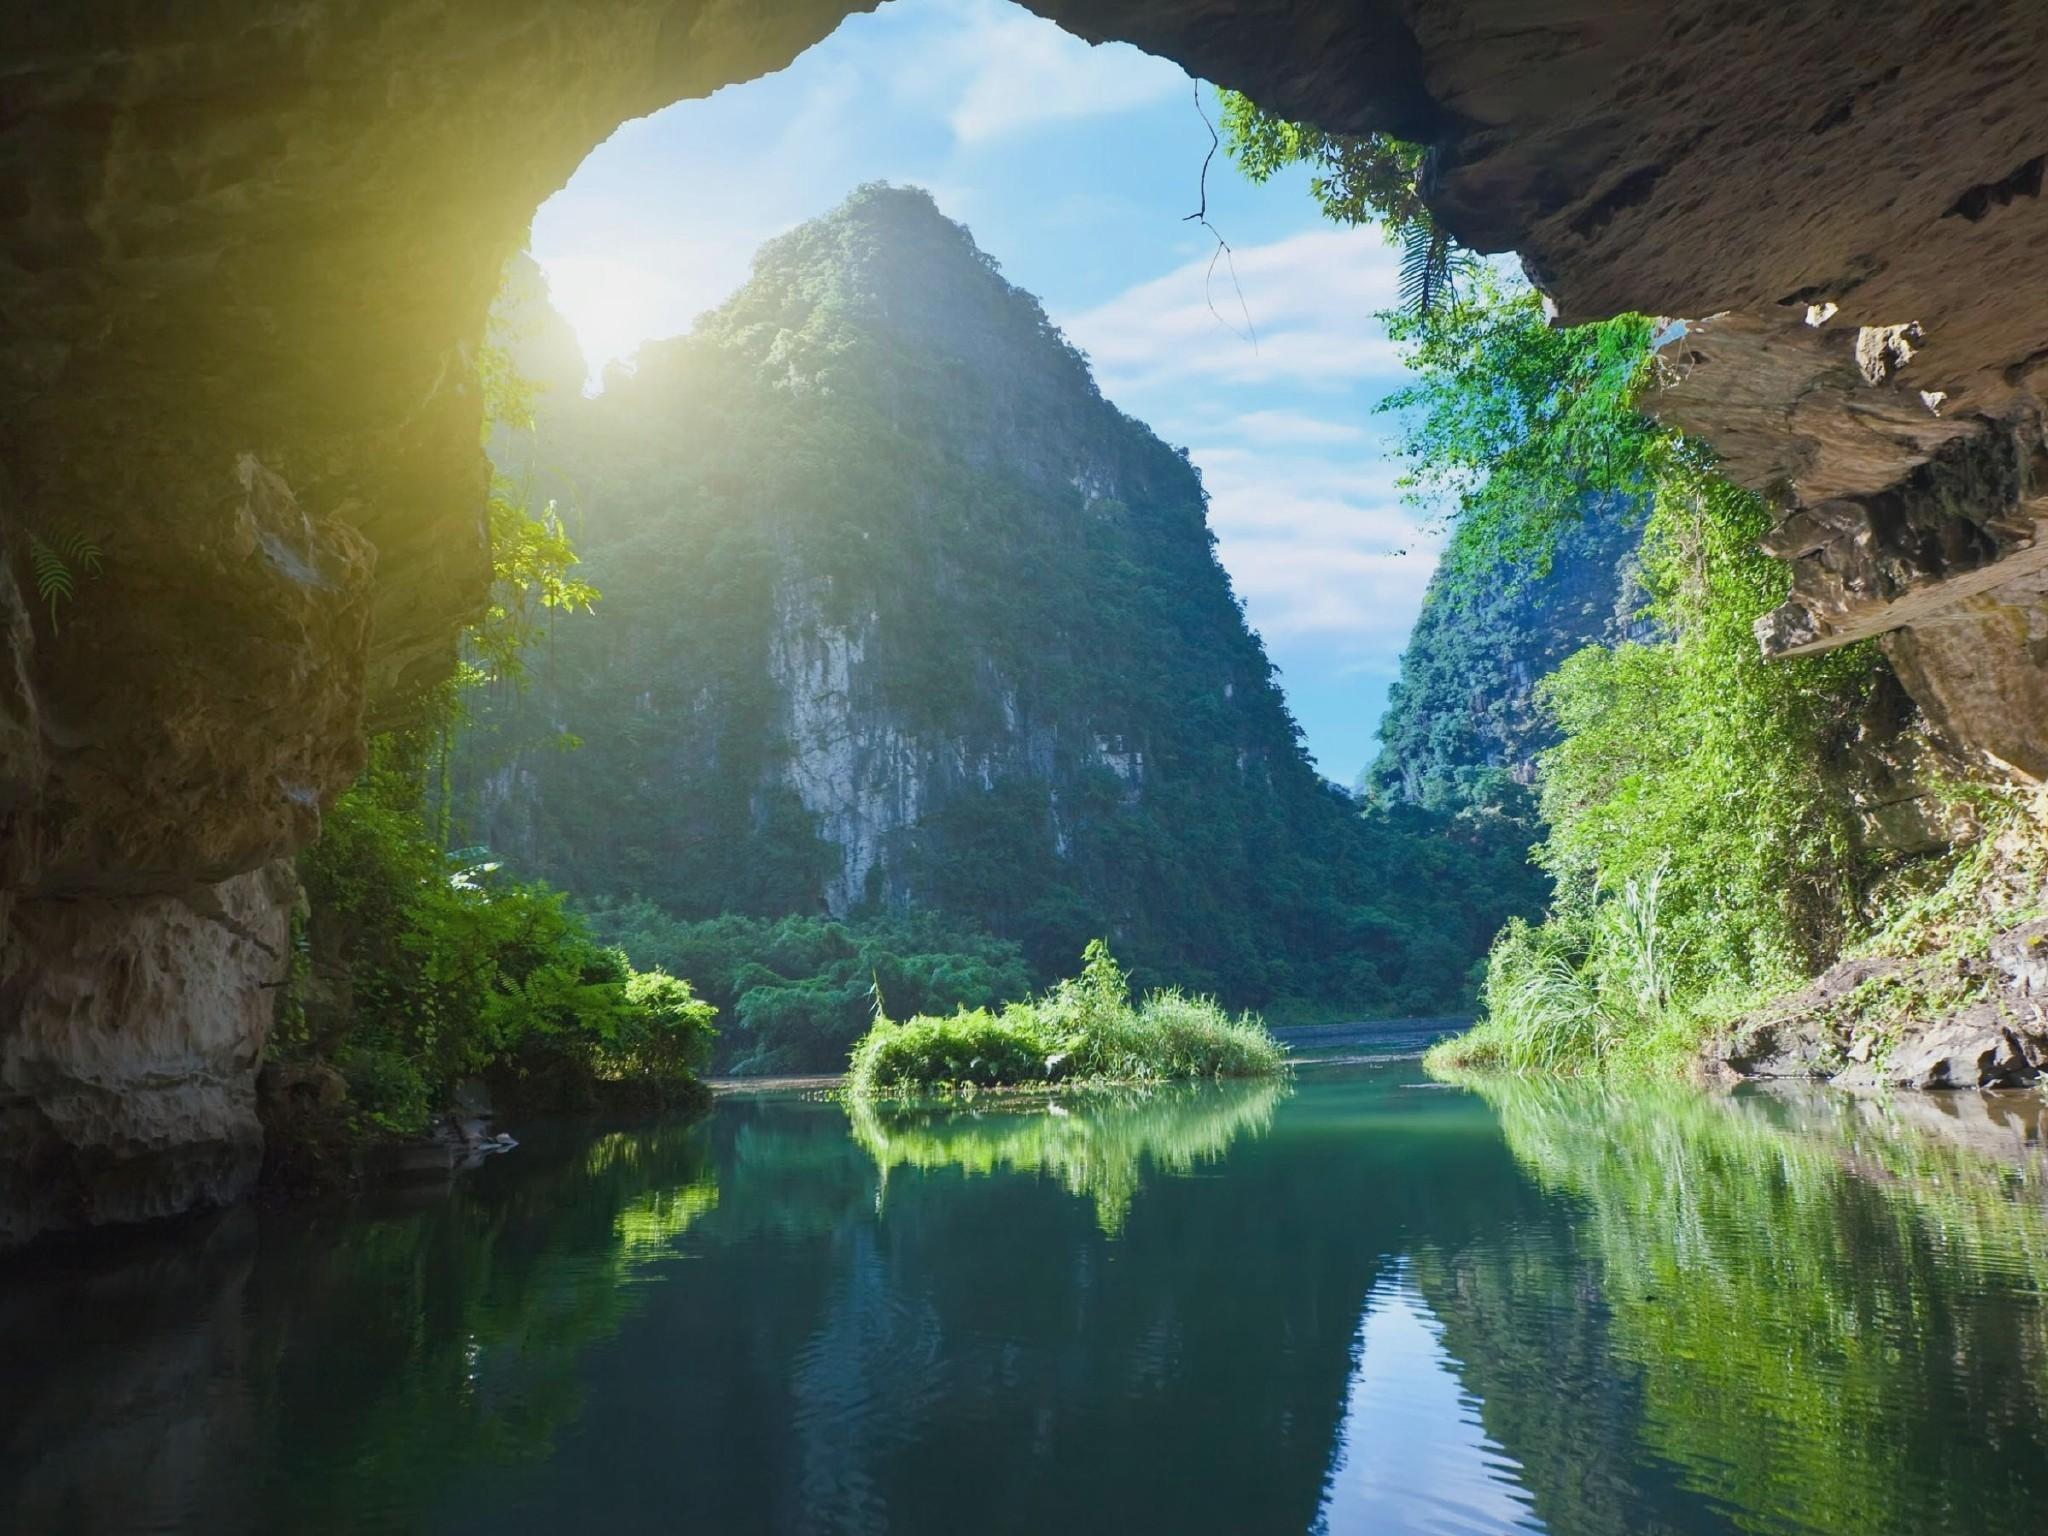 Vietnam wallpapers HD quality